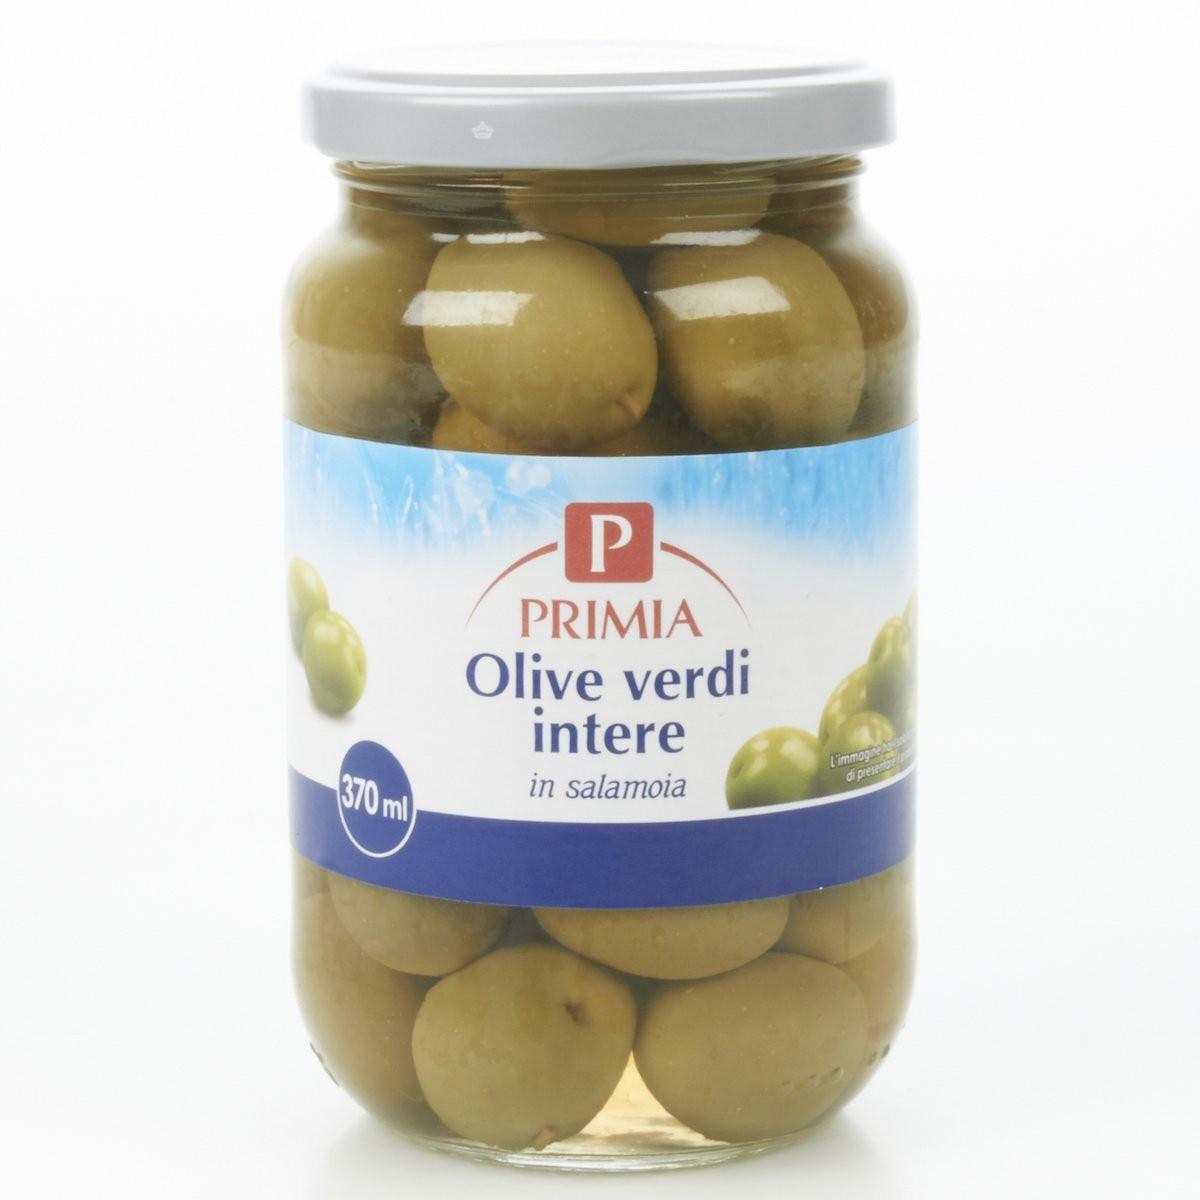 Primia Olive verdi intere in salamoia